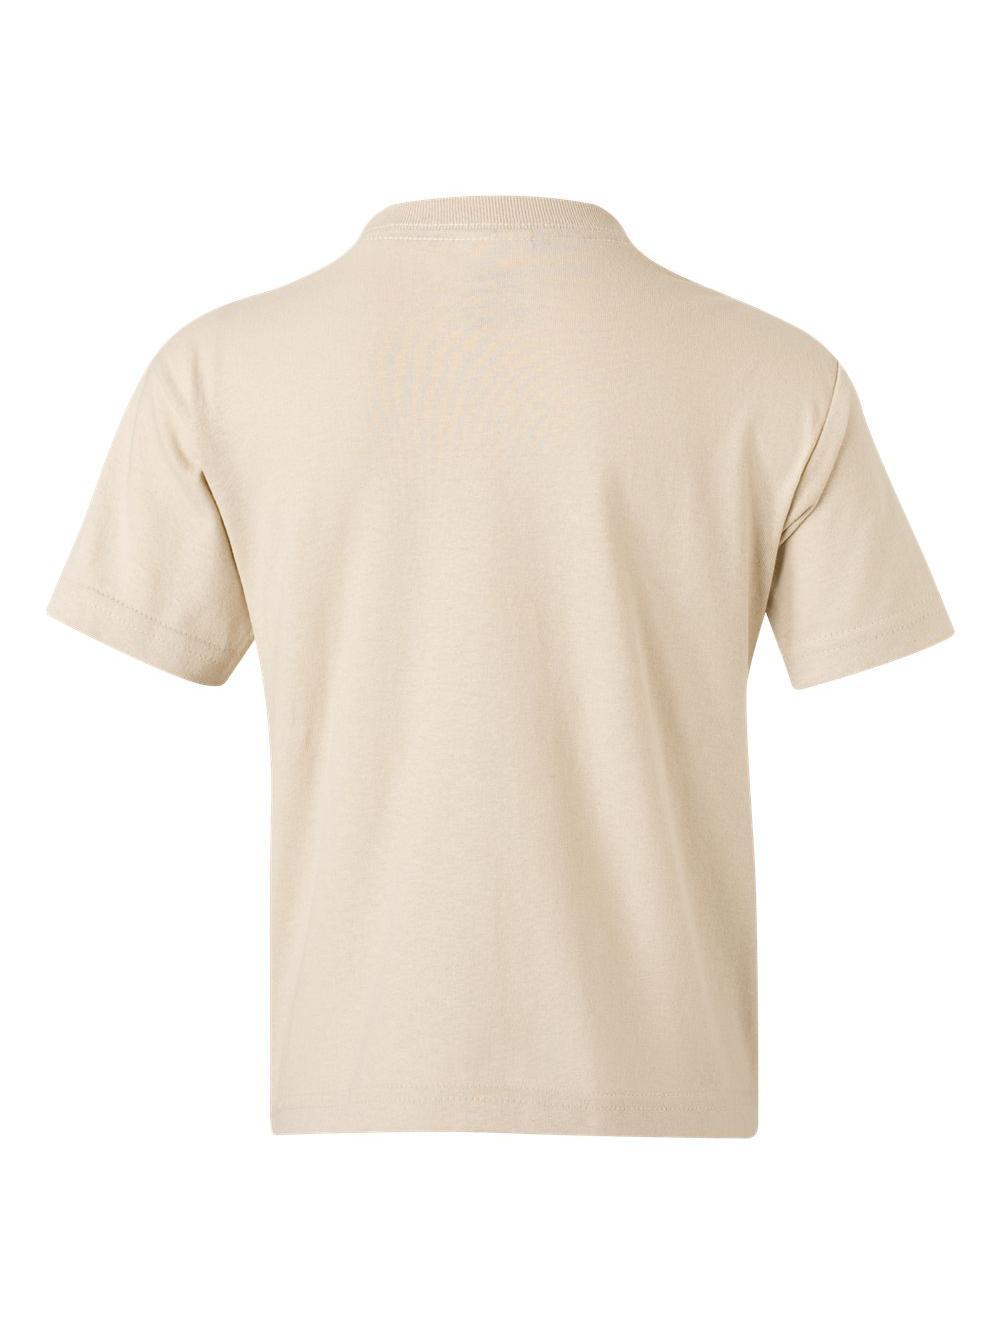 Gildan-Heavy-Cotton-Youth-T-Shirt-5000B thumbnail 124